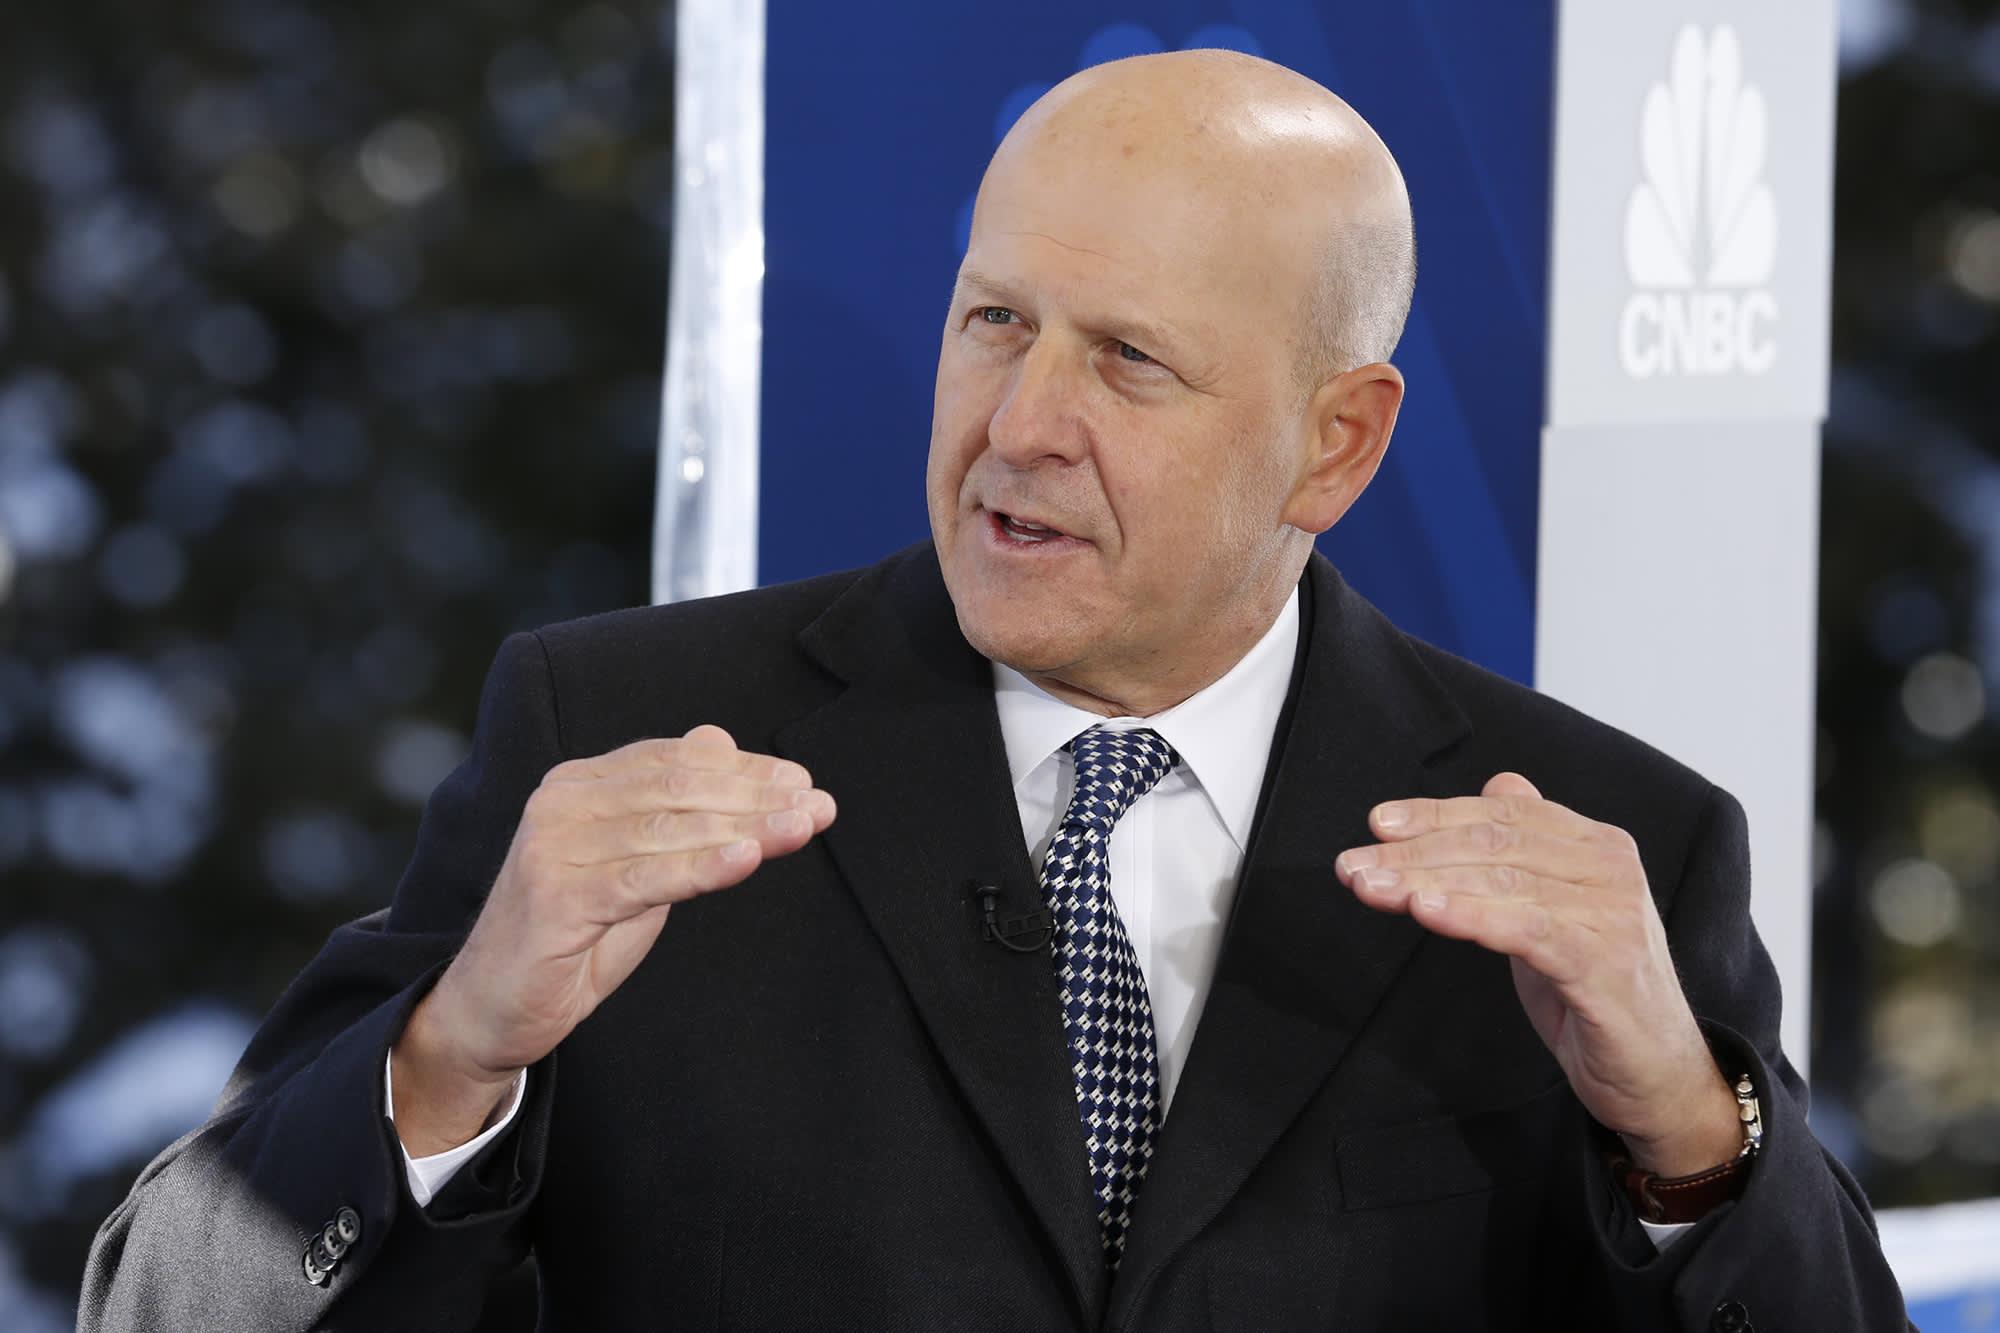 Goldman shares rise as CEO Solomon says client activity 'more constructive' after slow start